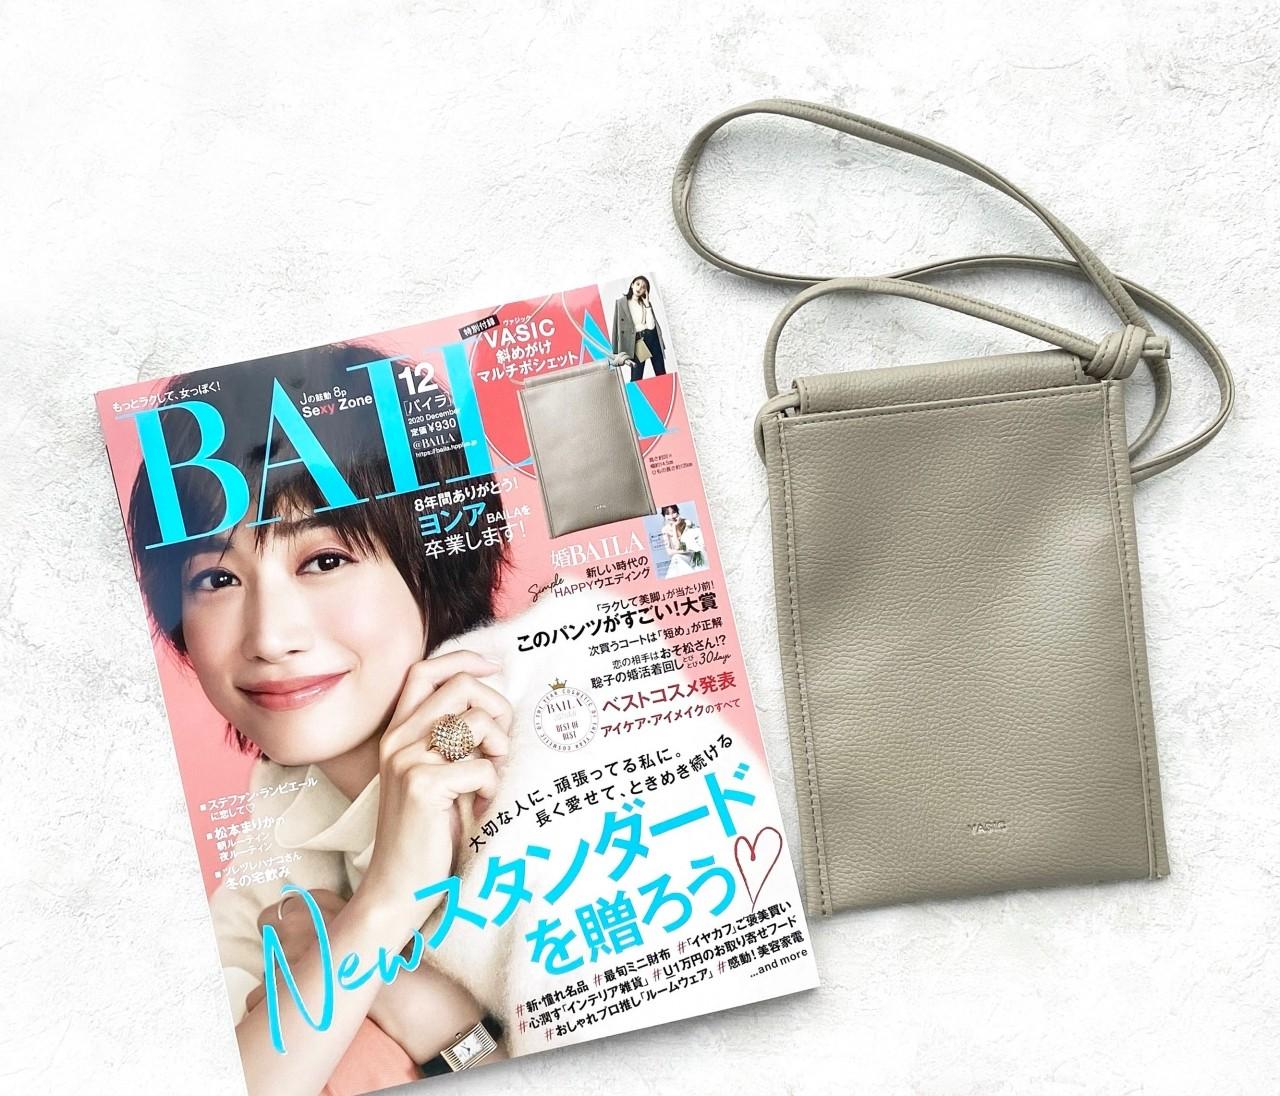 BAILA12月号発売♪今月号の読みどころは?